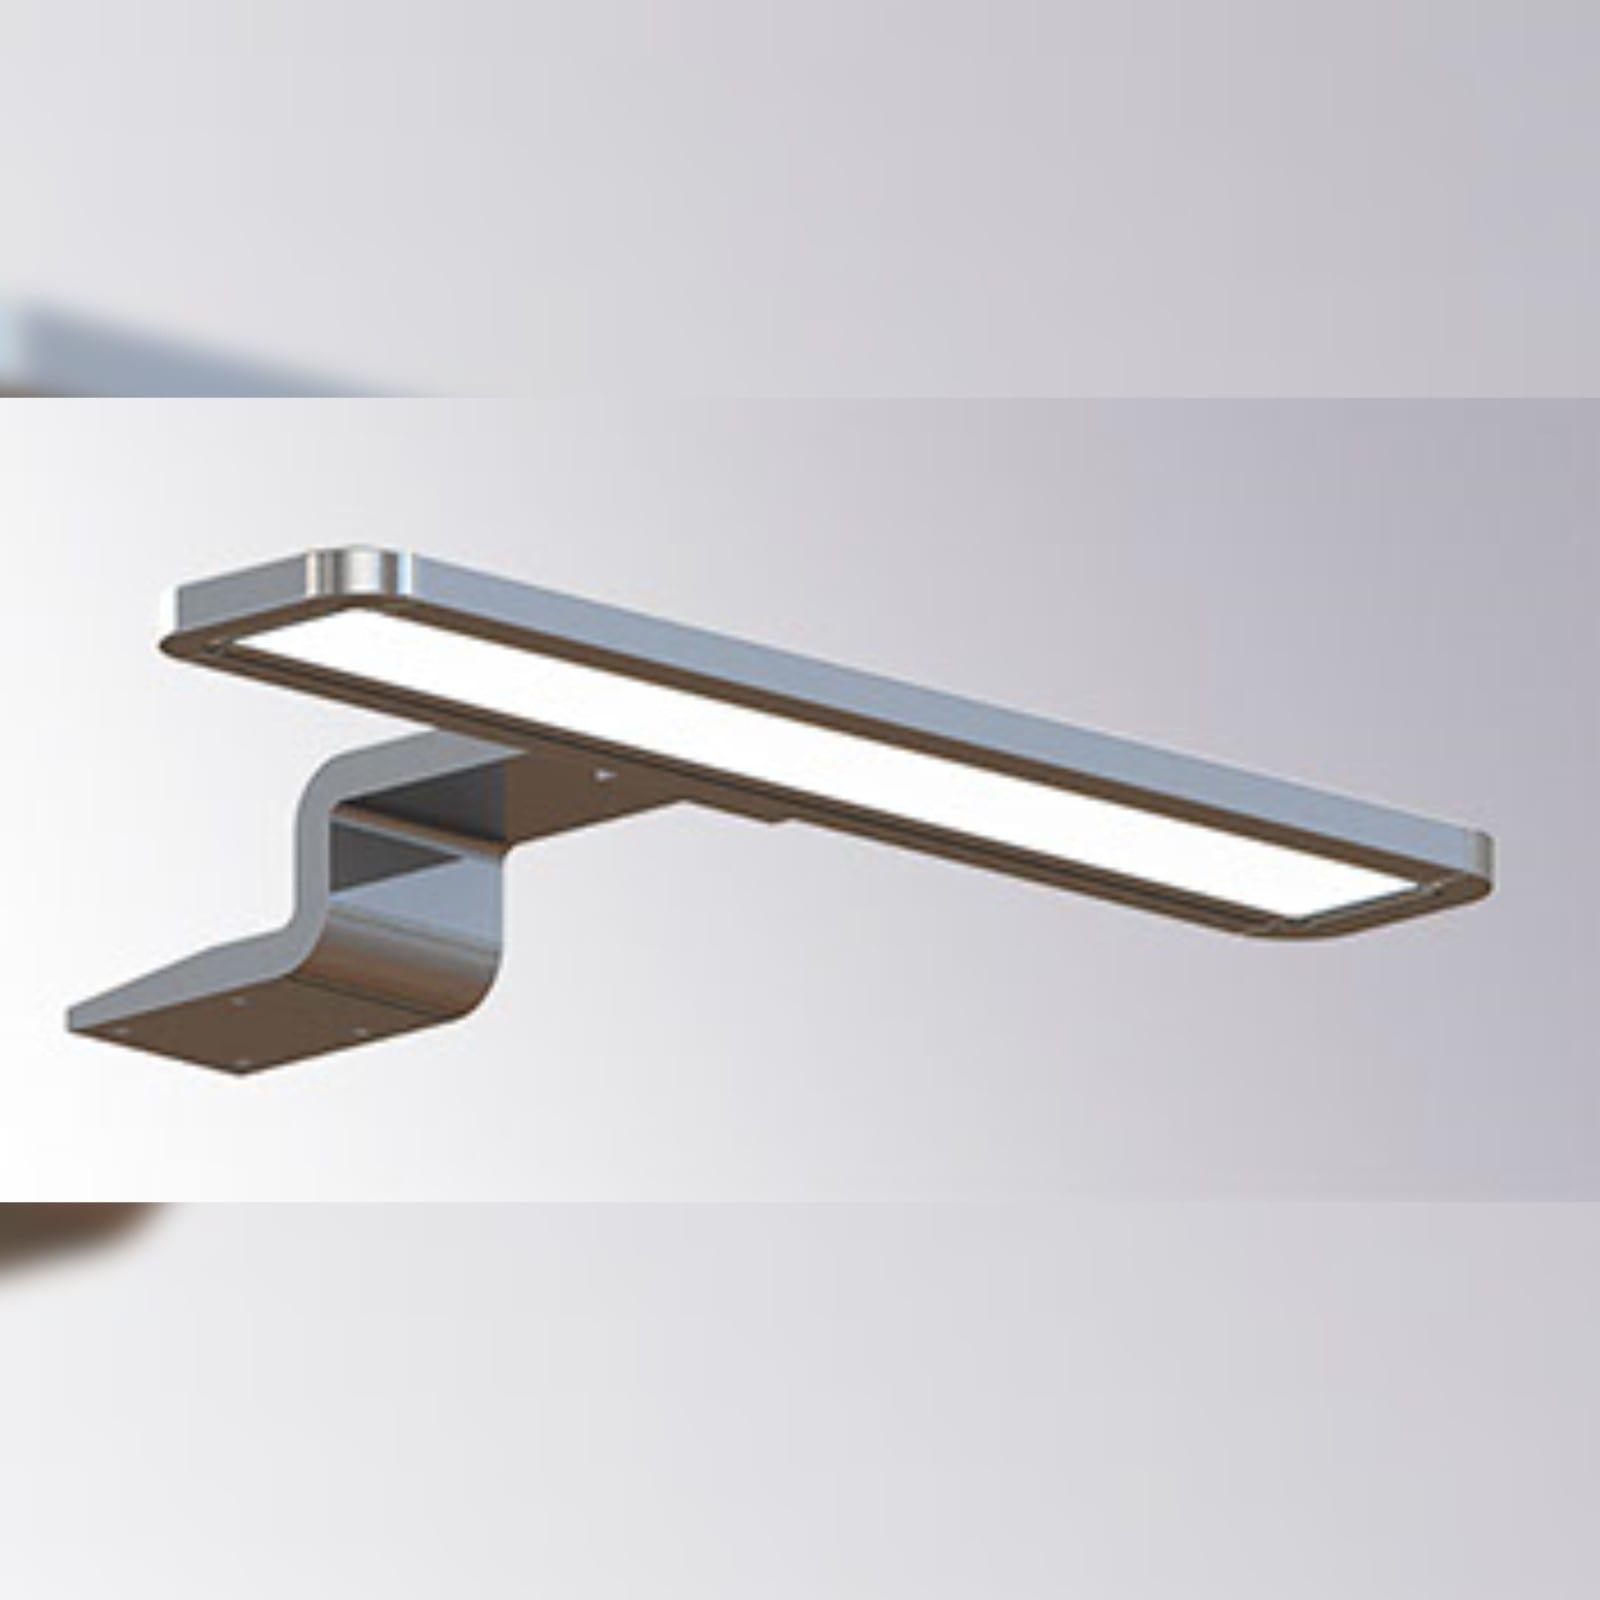 Mosel LED skaplampe 13W 230V IP44   Illuminor as